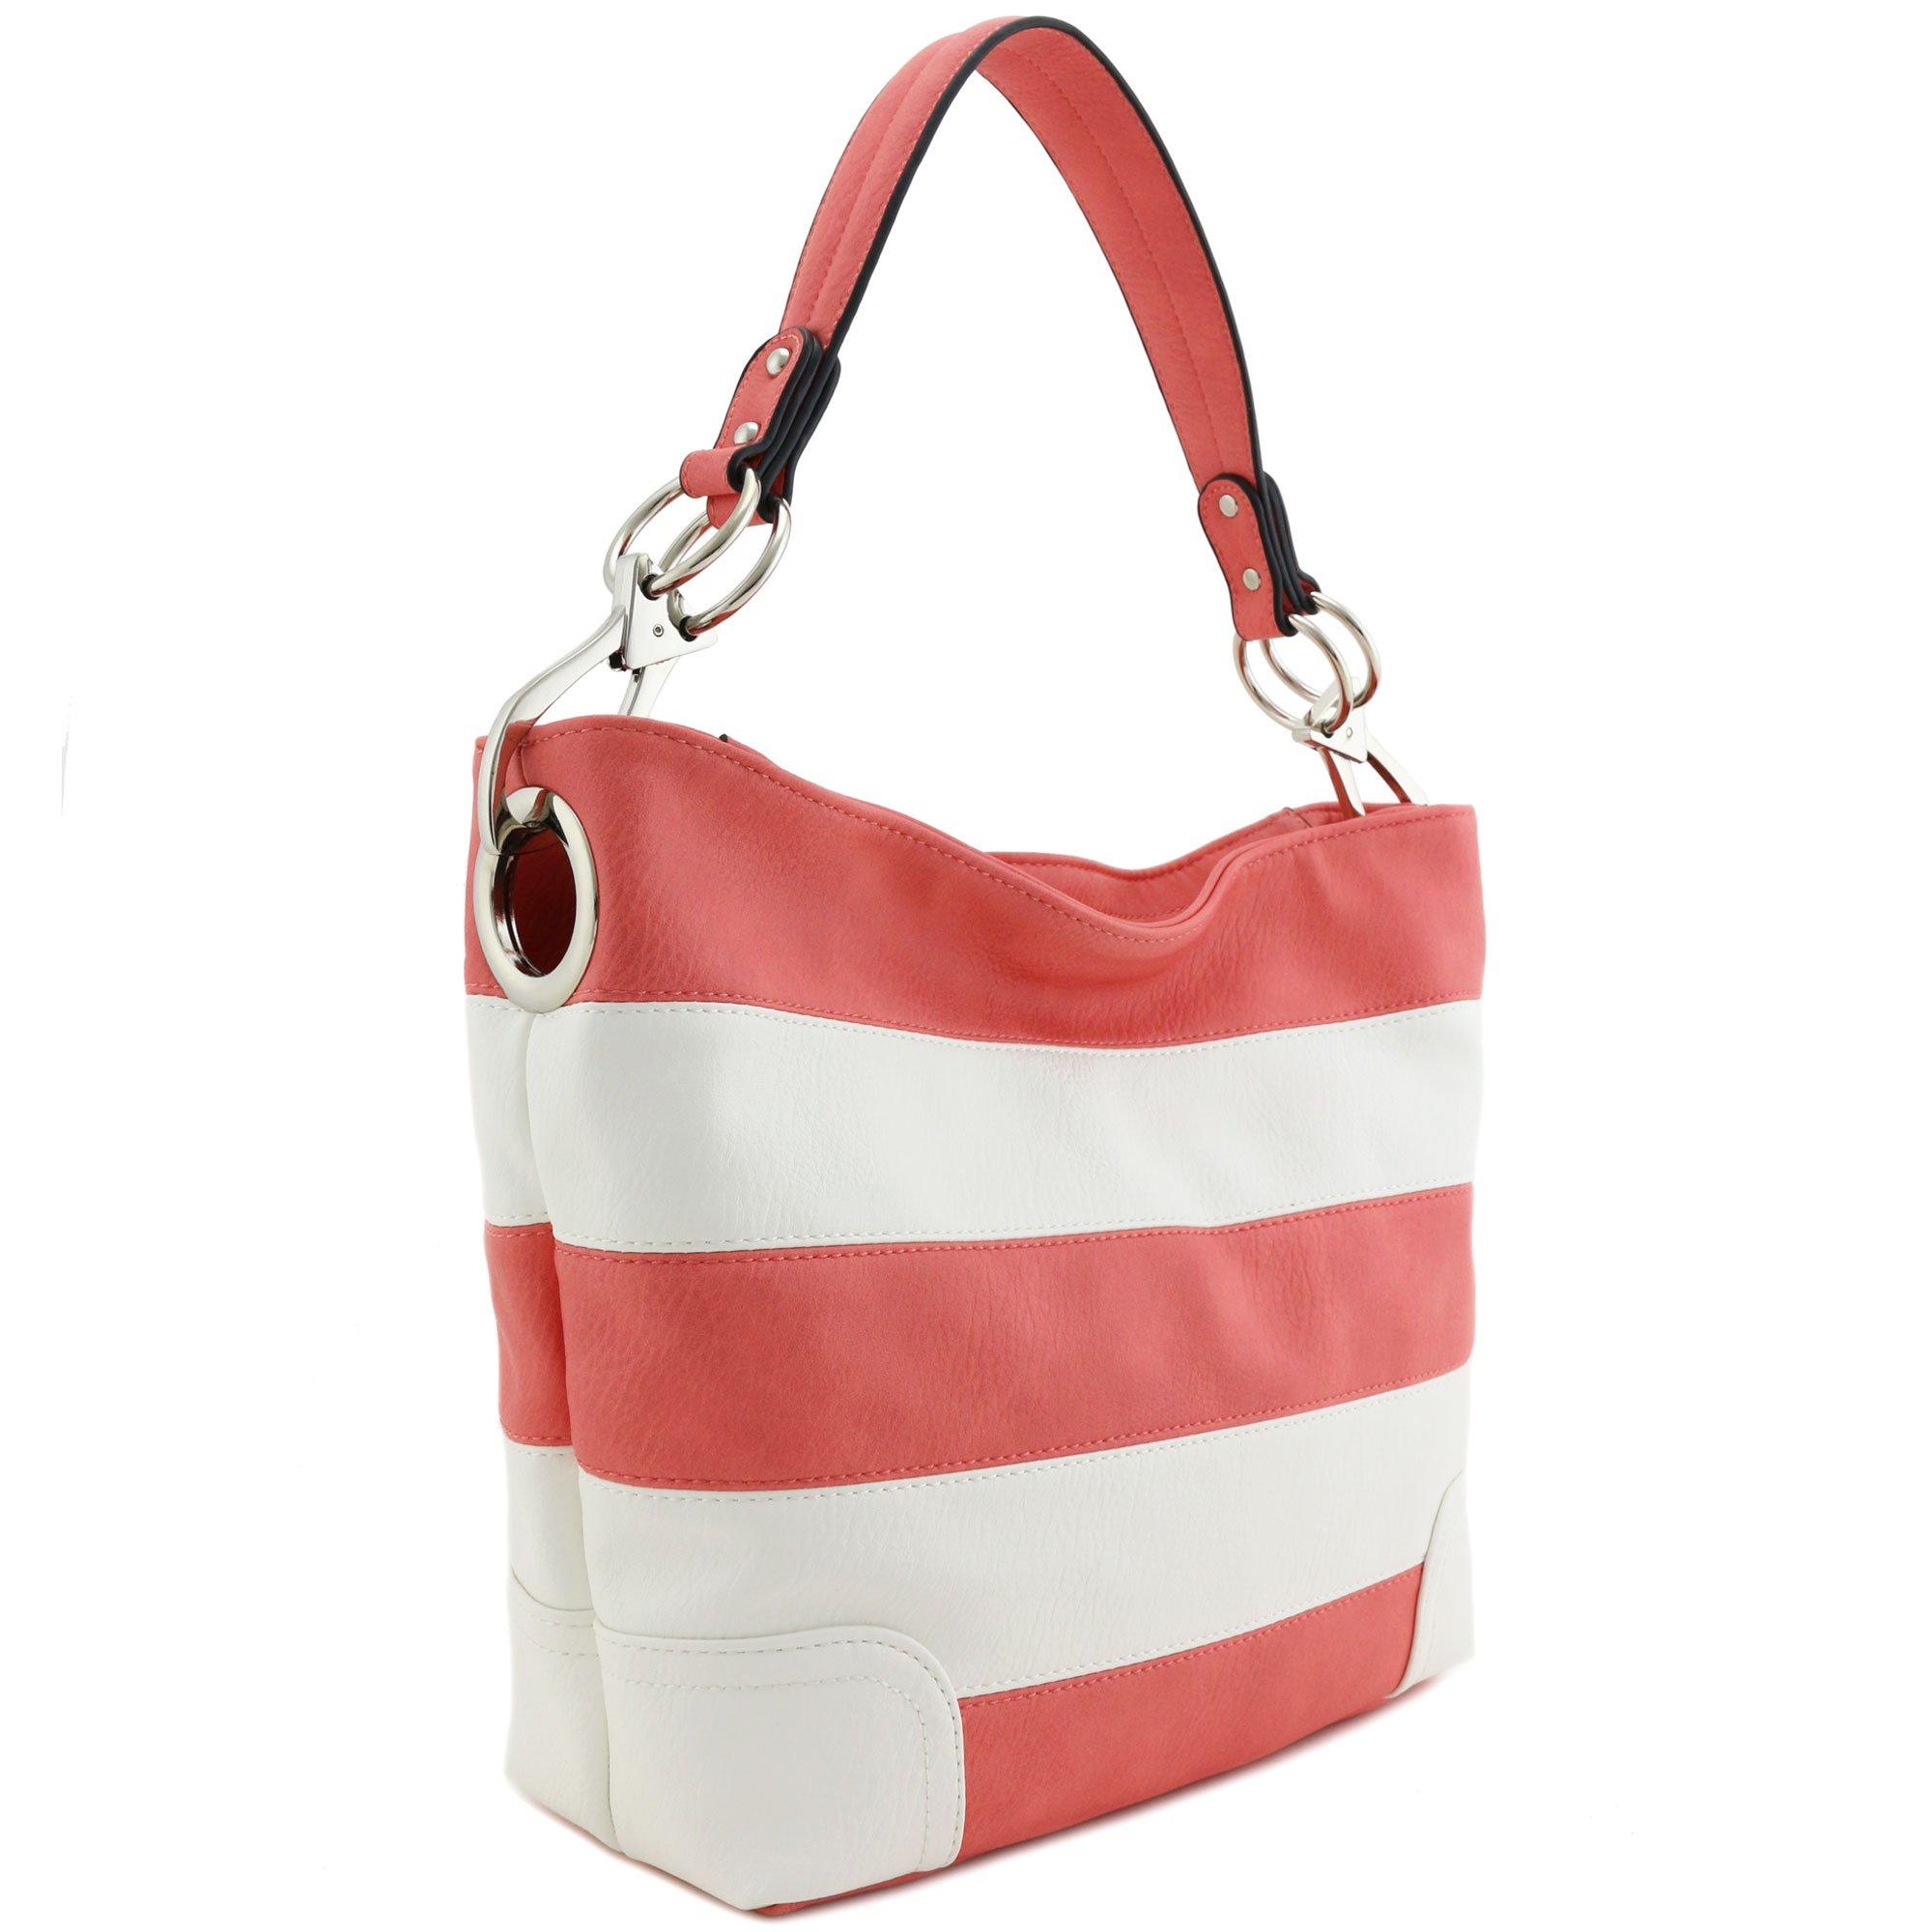 Hobo Shoulder Bag with Big Snap Hook Hardware (Peach/White)